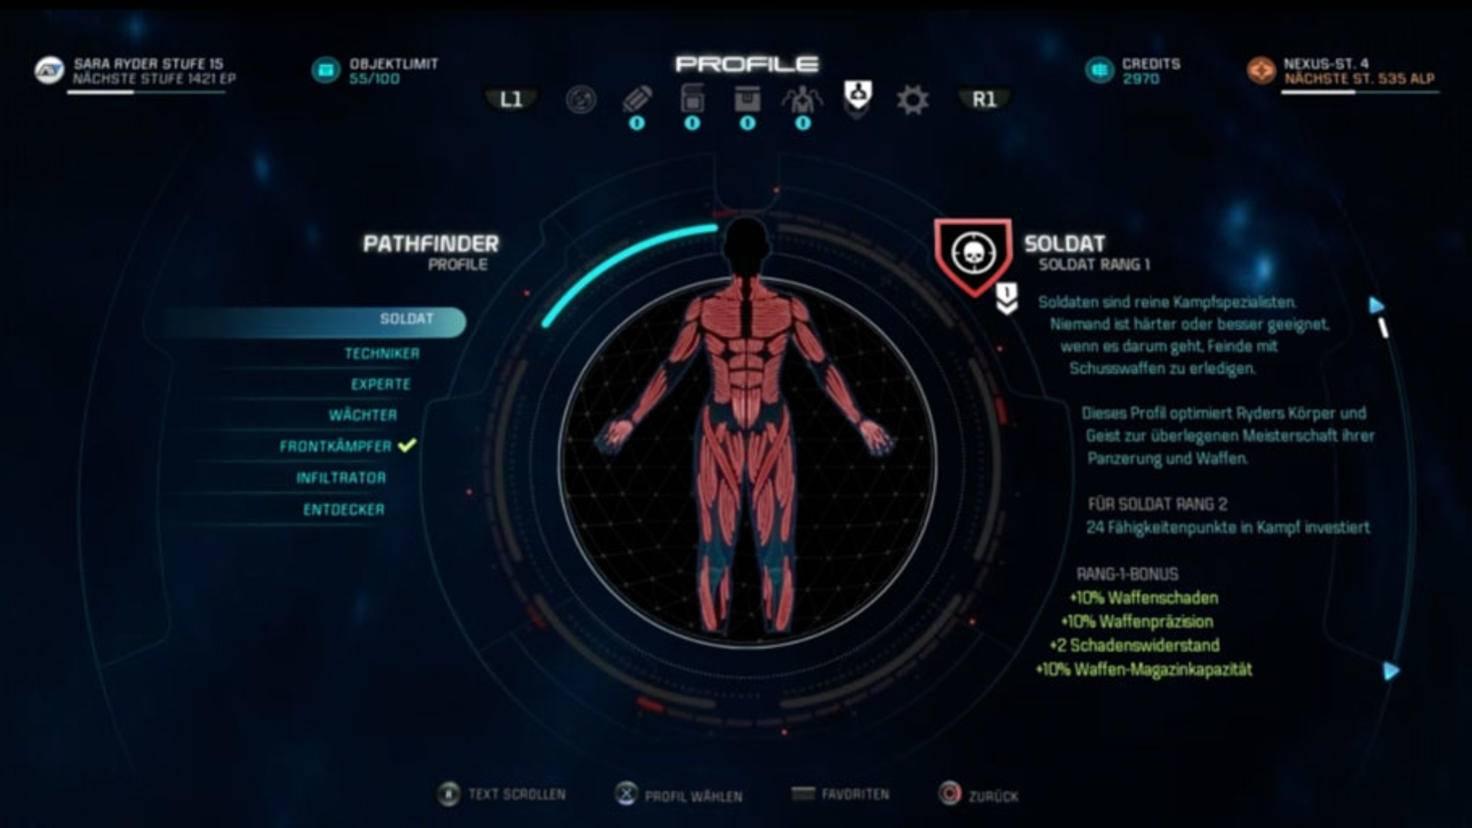 Mass-Effect-Andromeda-Profile